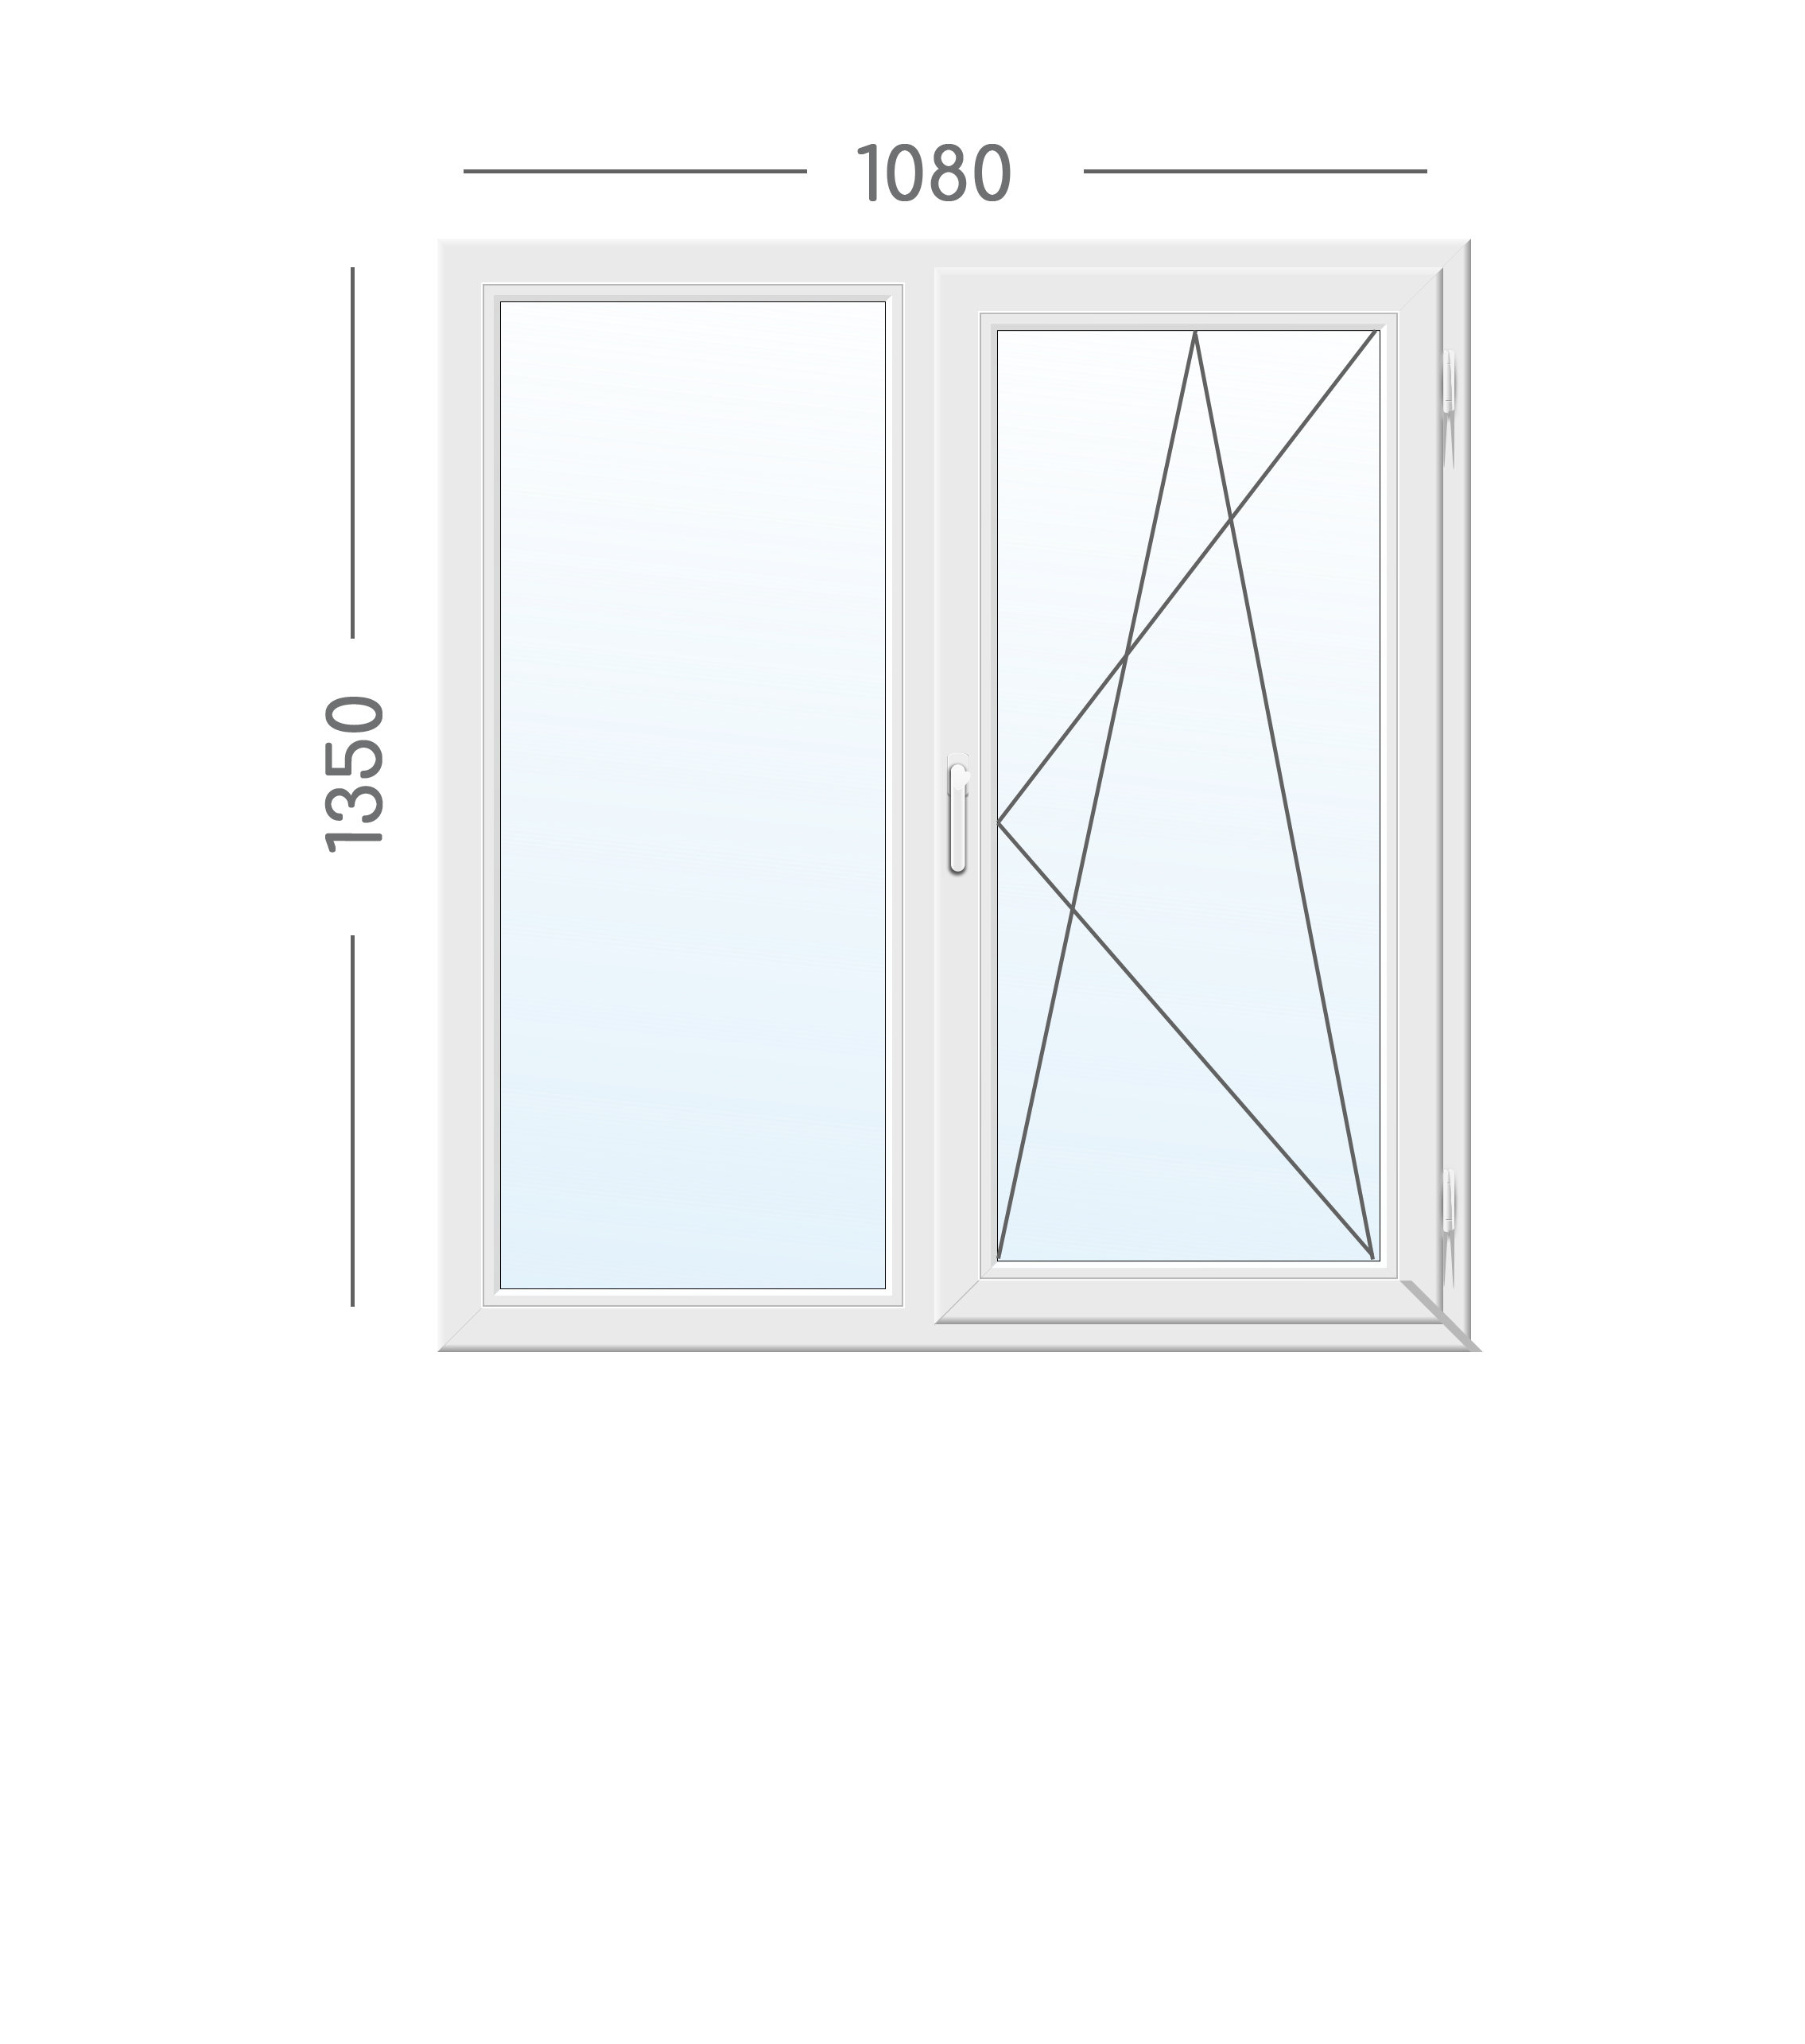 Двустворчатое окно WDS Galaxy с фурнитурой VORNE (Турция)